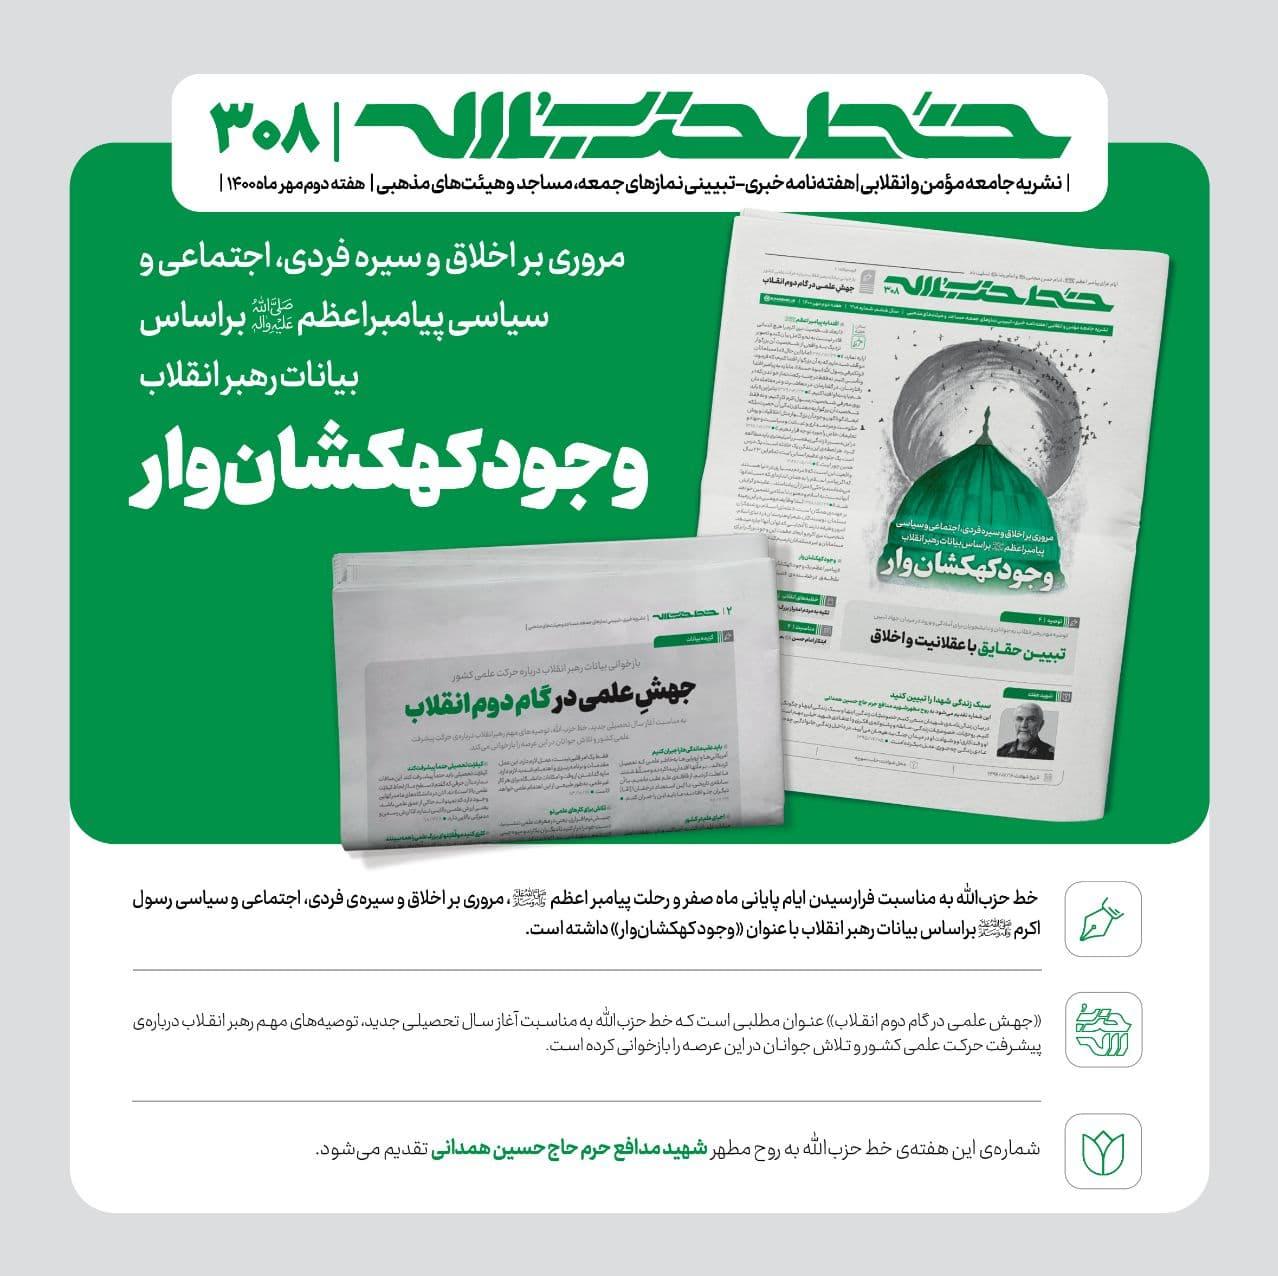 14000708000909 Test NewPhotoFree - انتشار شماره ۳۰۸ خط حزبالله با عنوان « وجود کهکشانوار»